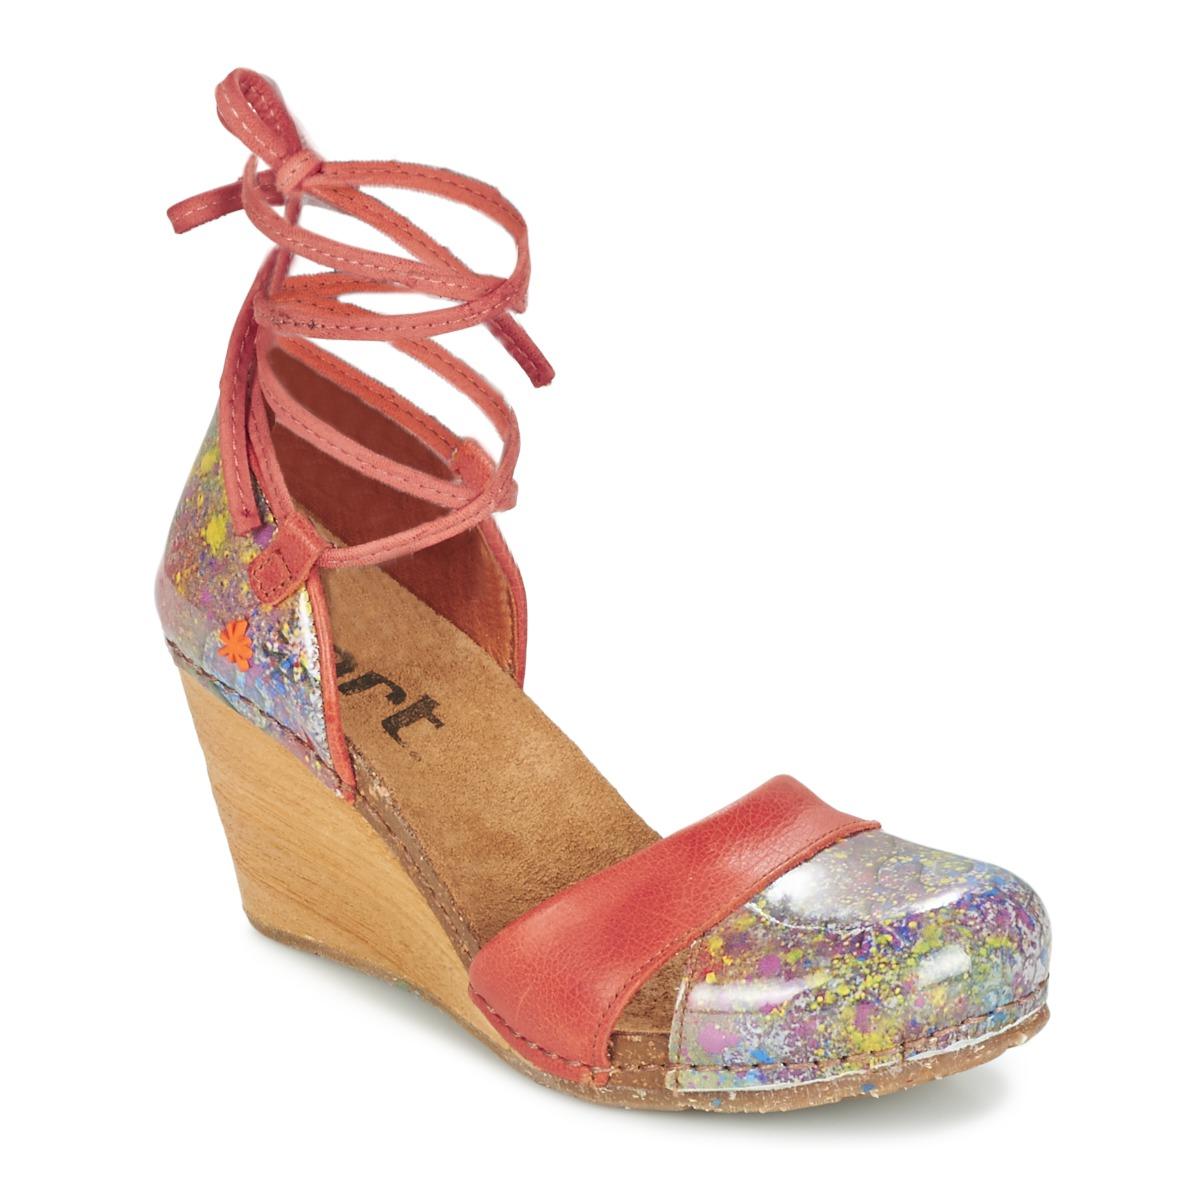 Sandale Art VALBY 499 Multicolore